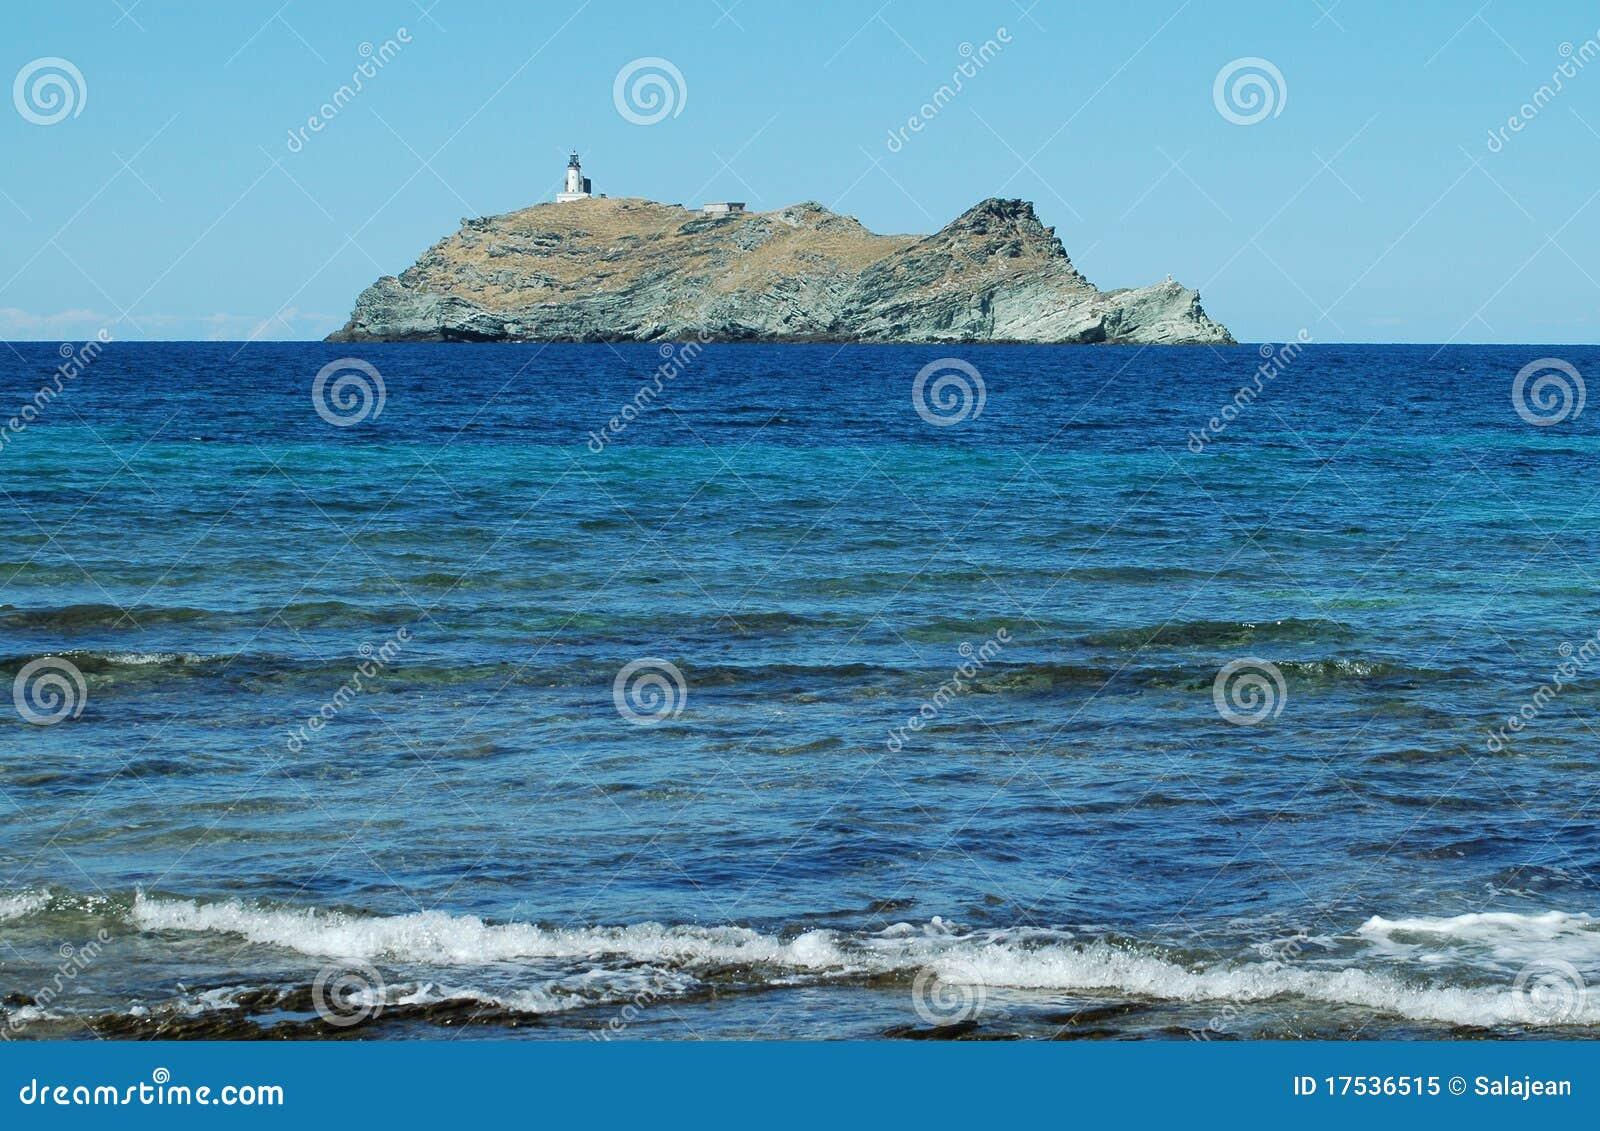 Island with lighthouse near Corsica